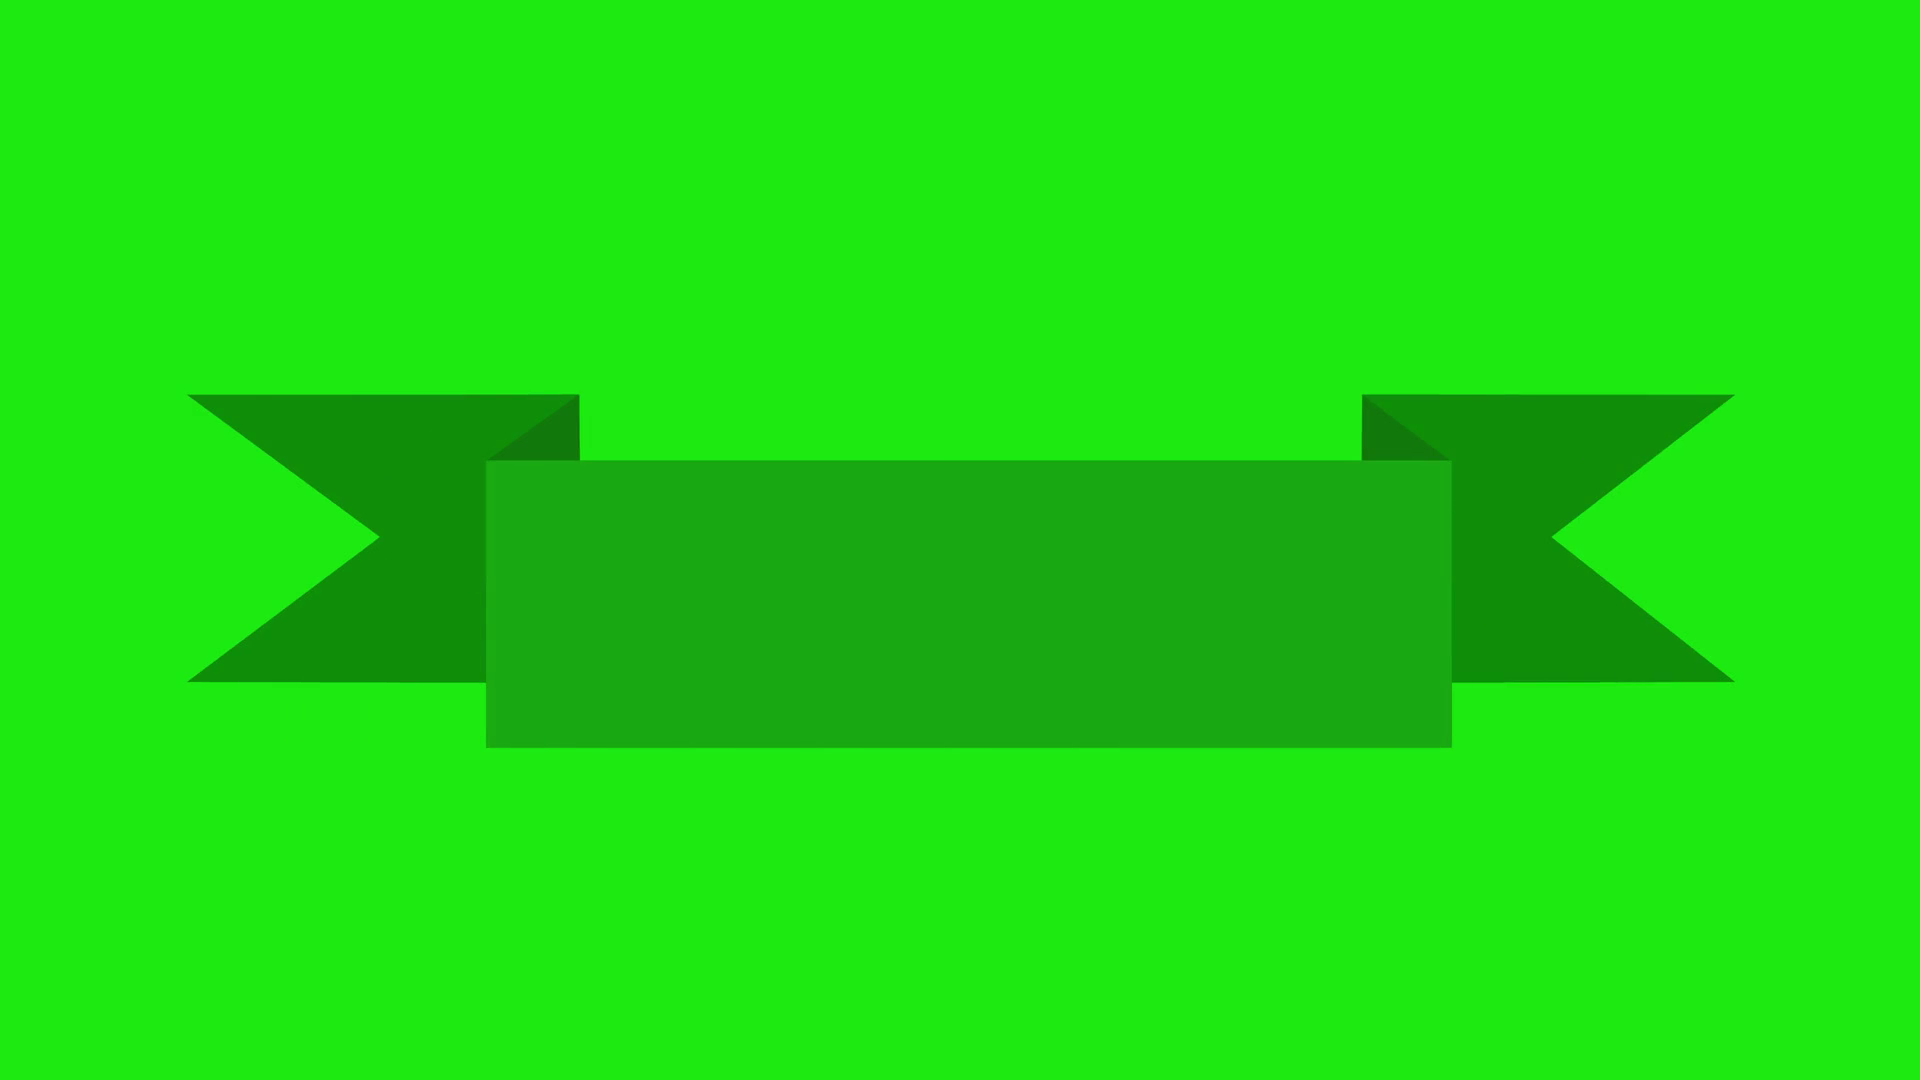 Green ribbon photo